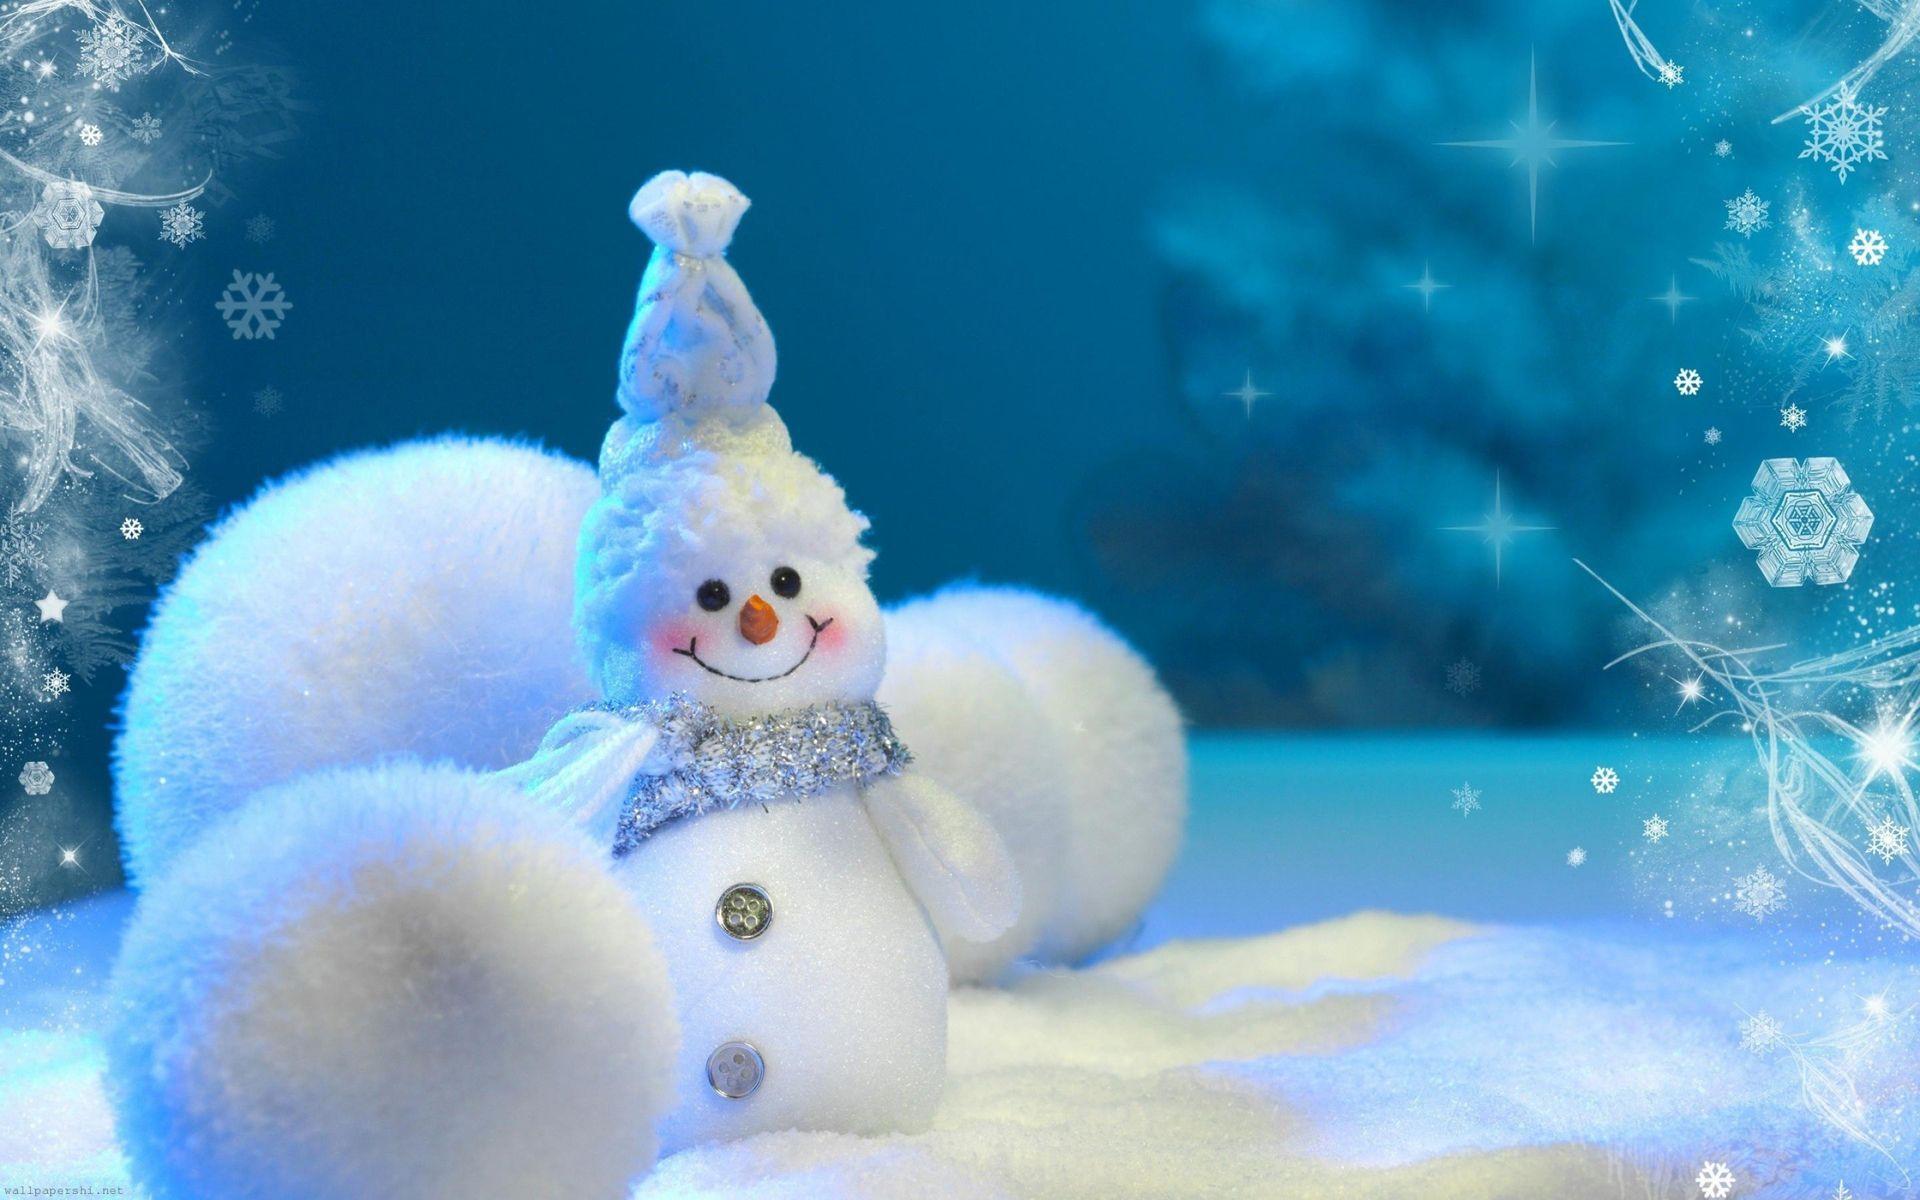 Cute Christmas Desktop Background Snowman Wallpaper Cute Christmas Wallpaper Christmas Wallpaper Free